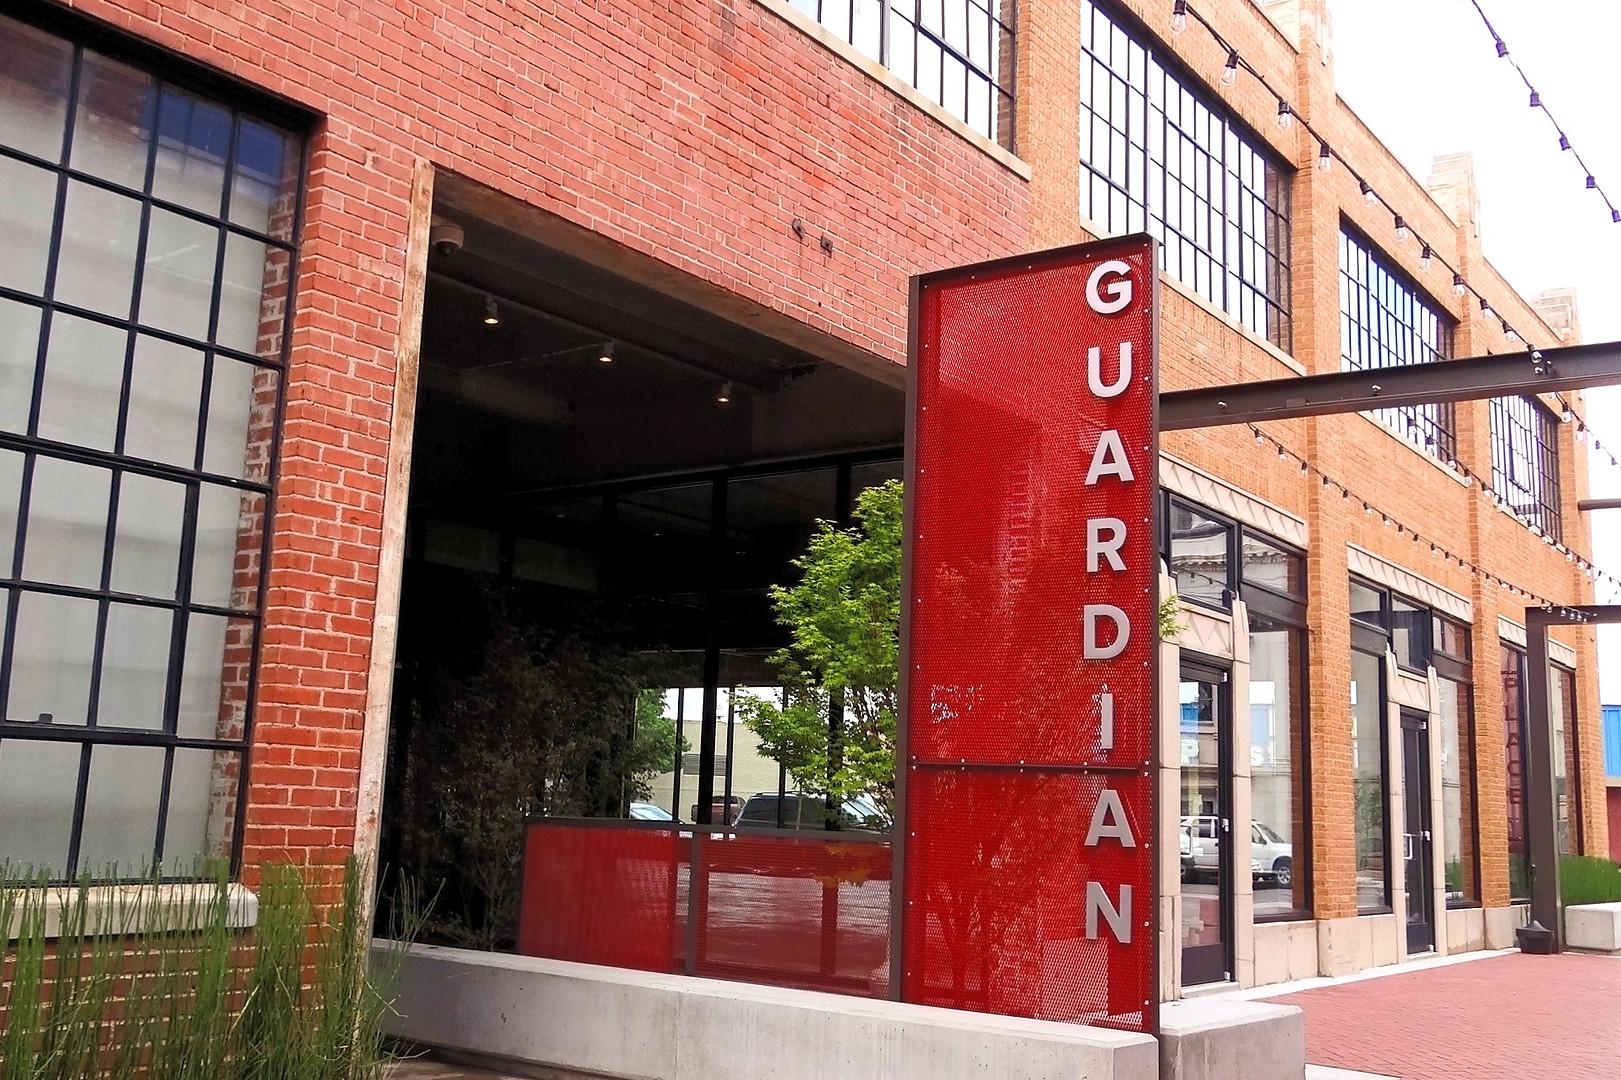 Guardian Building